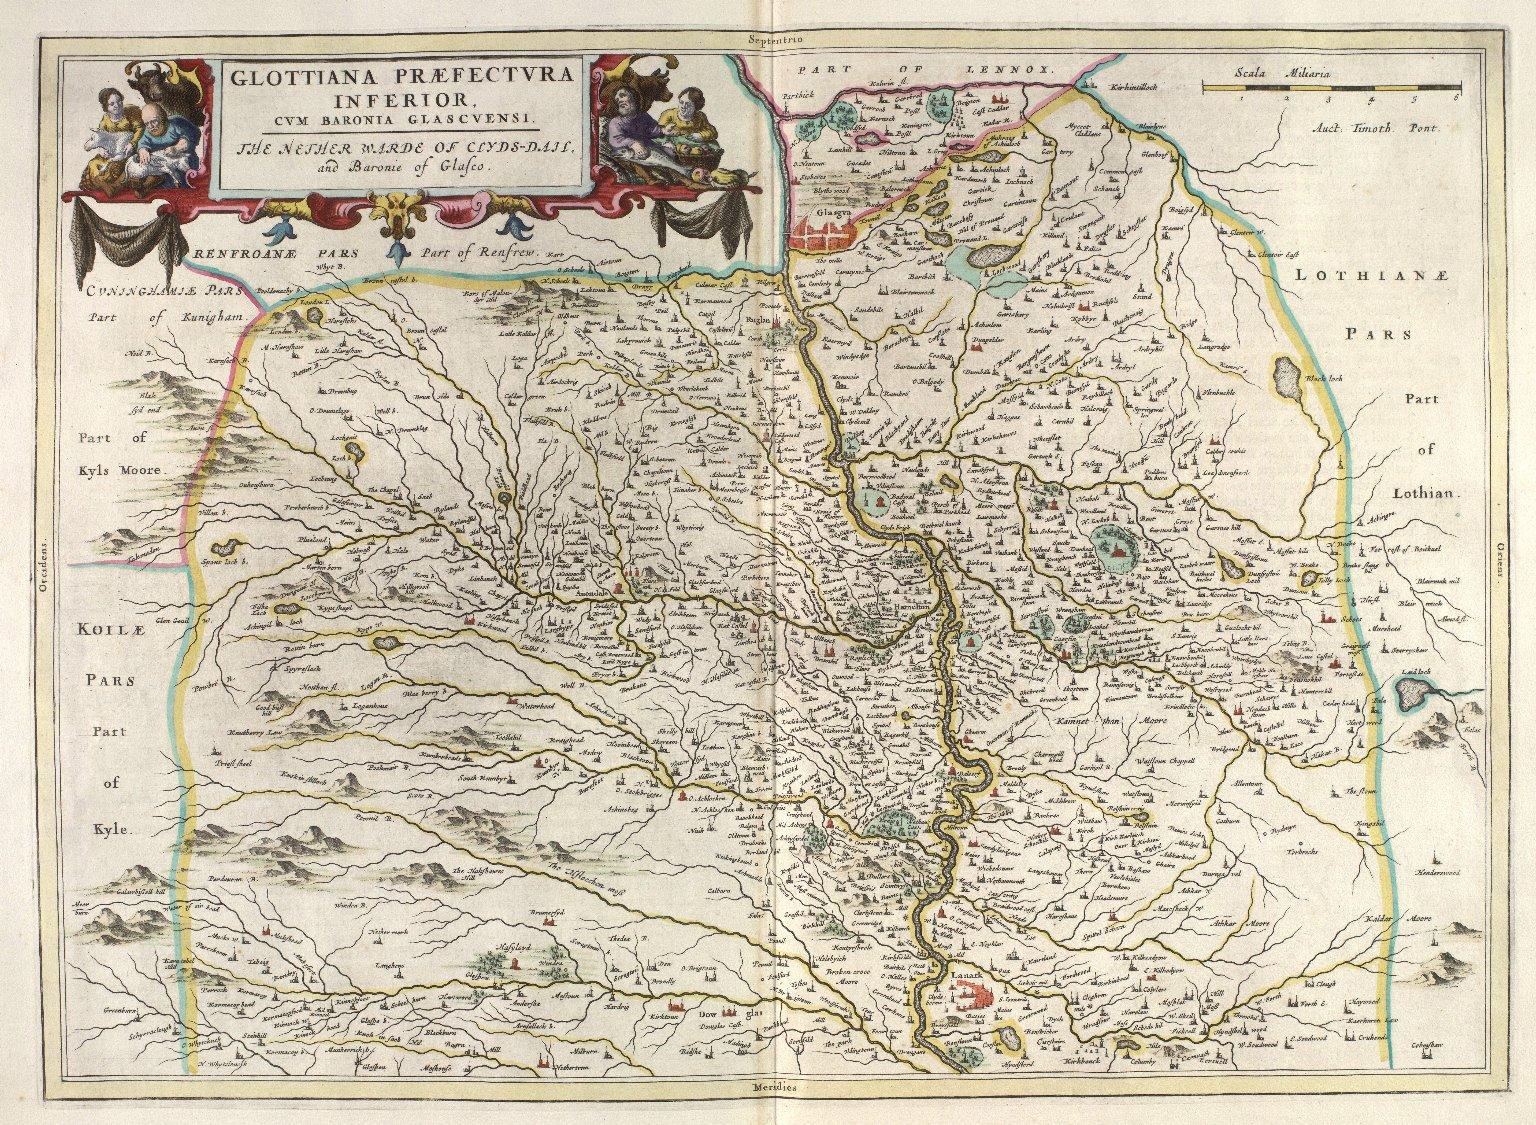 [Geographiae Blavianae] [Also known as: Atlas major] [074 of 153]